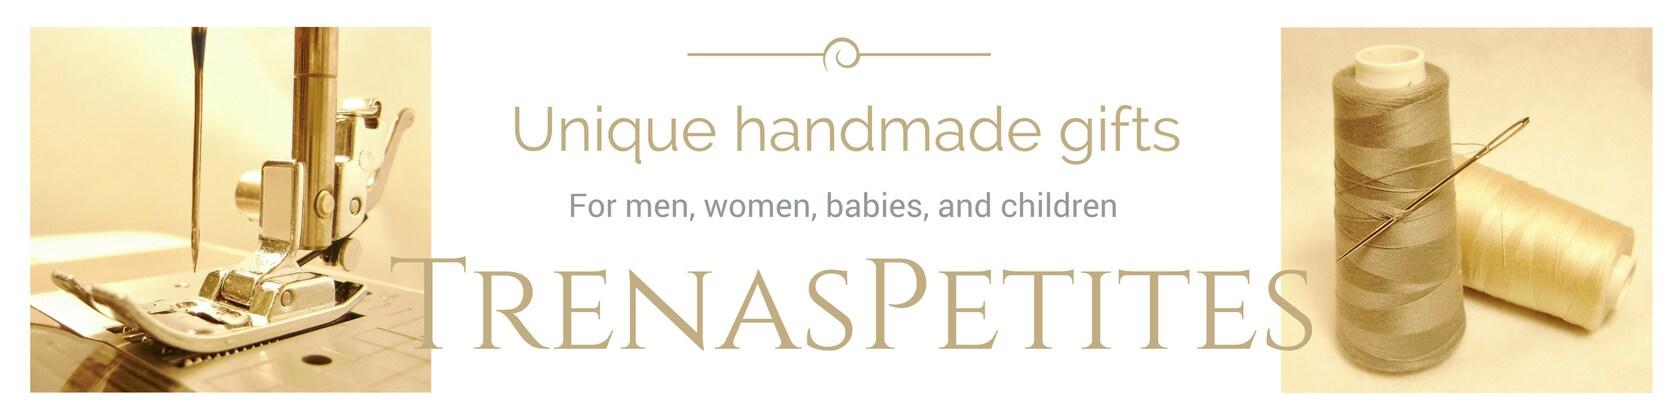 Useful handmade gifts 28 images homesthetics magazine for Handmade useful items